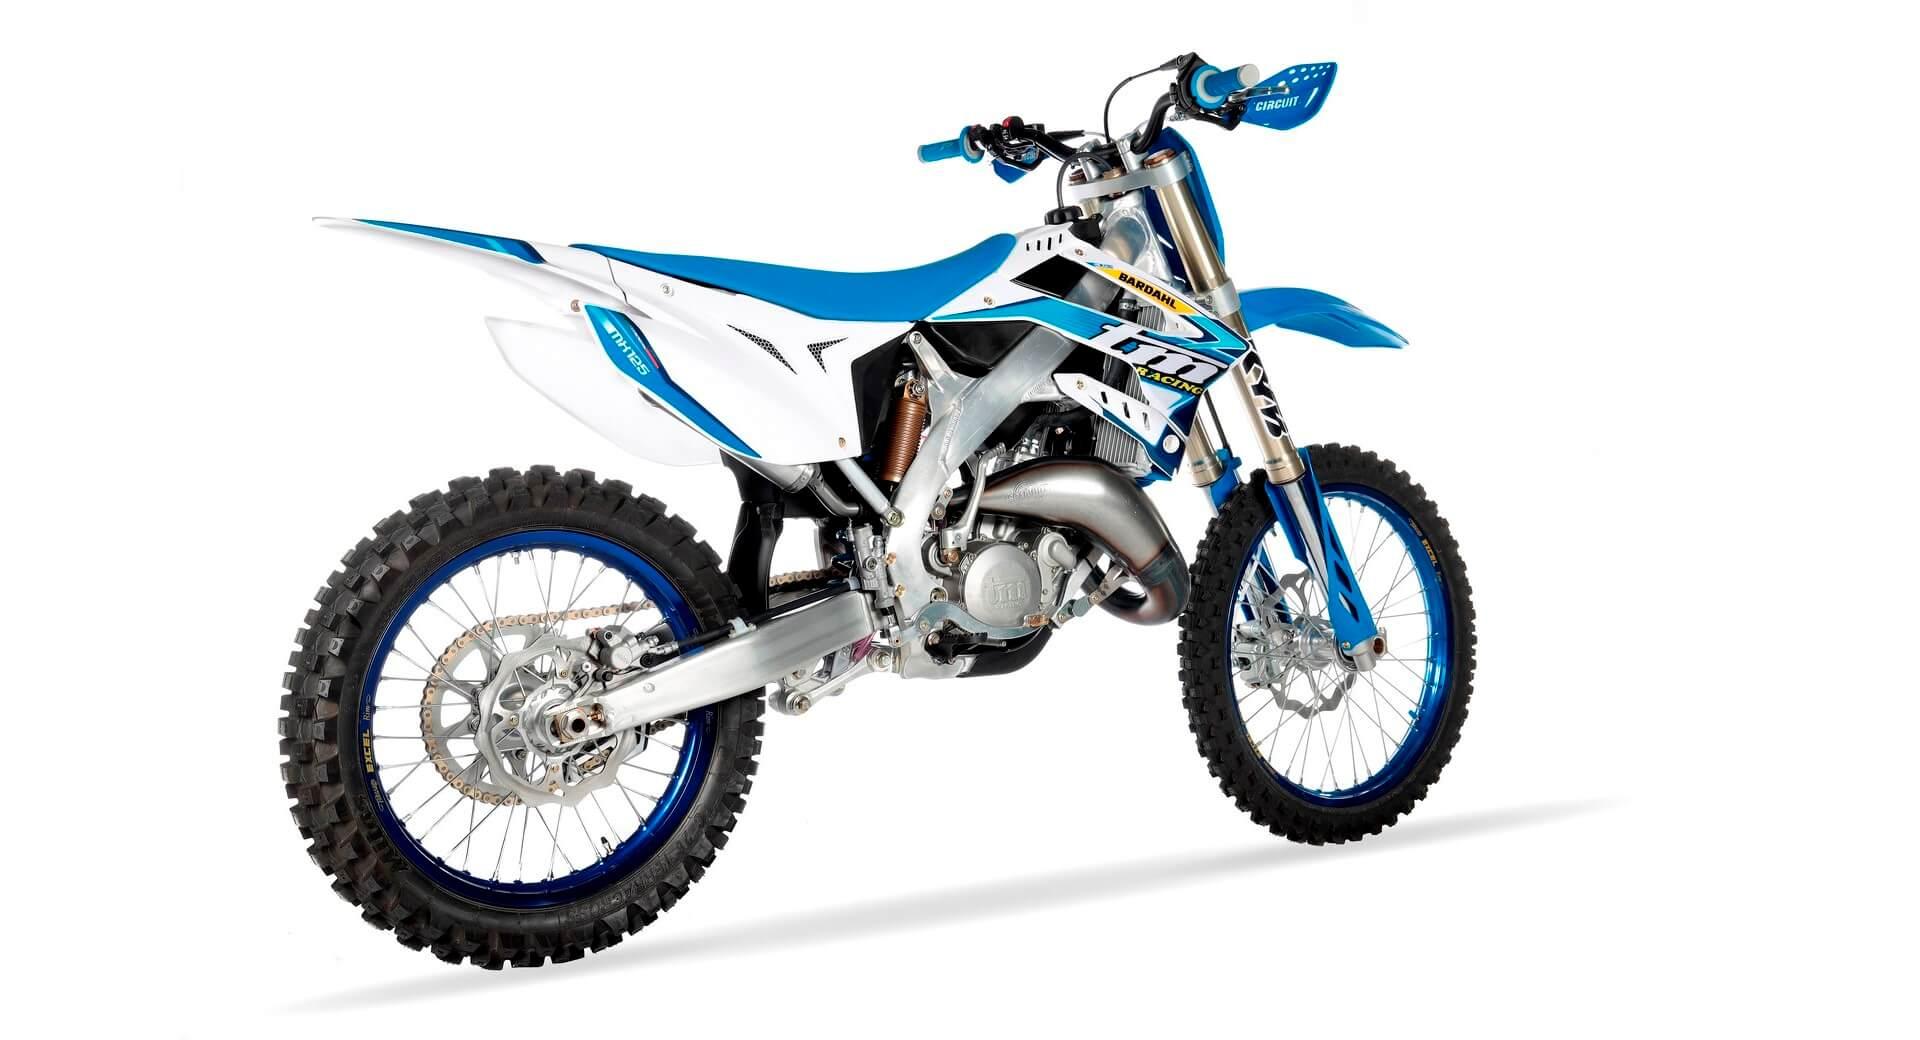 MX 125 2T 06